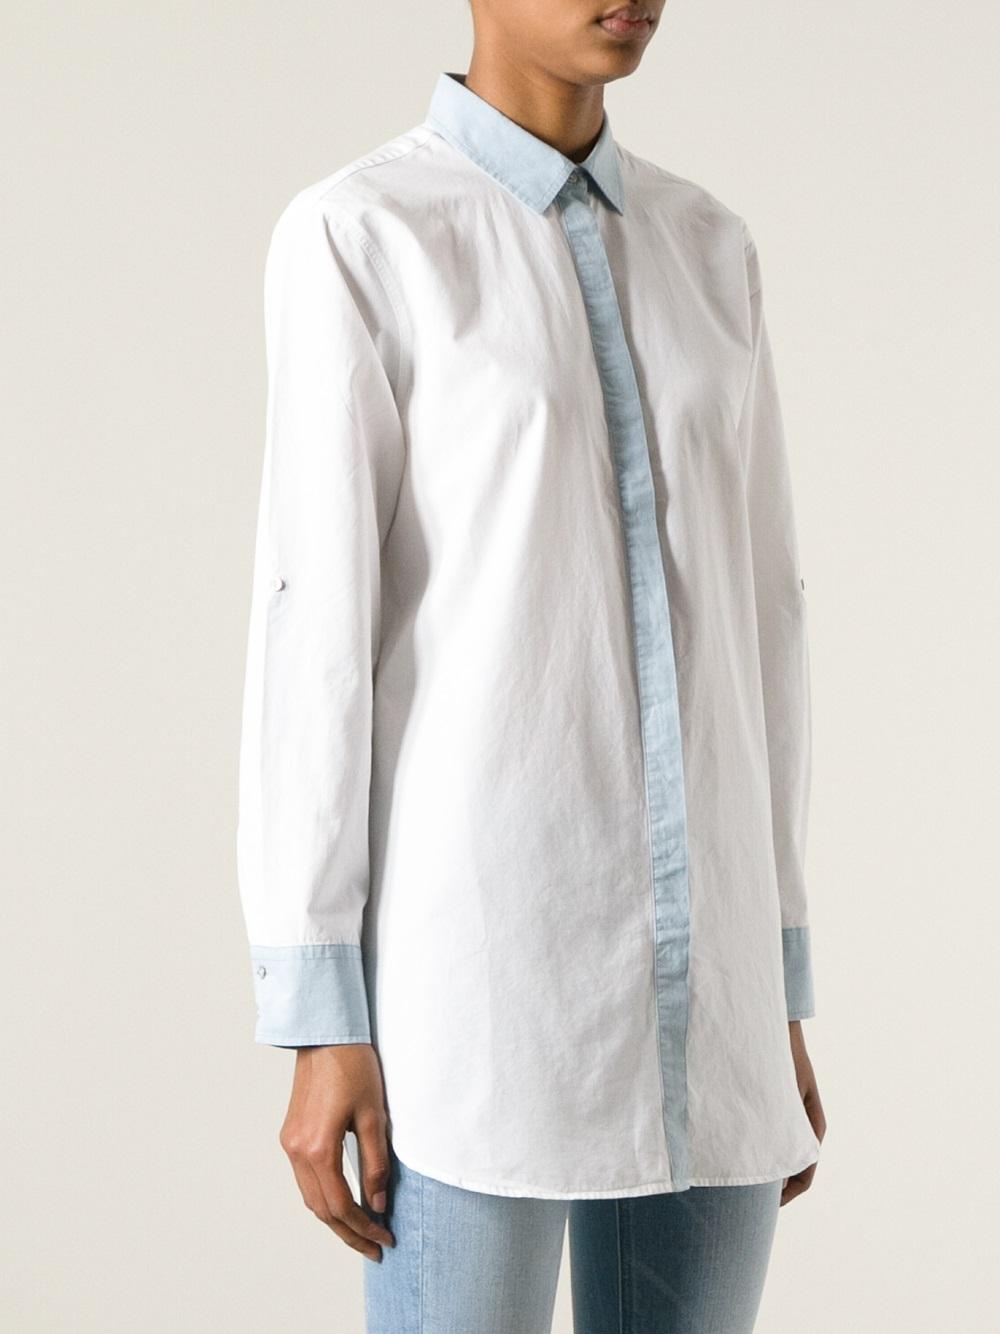 e0968e61ee994 Lyst - M.i.h Jeans Oversized Shirt in White